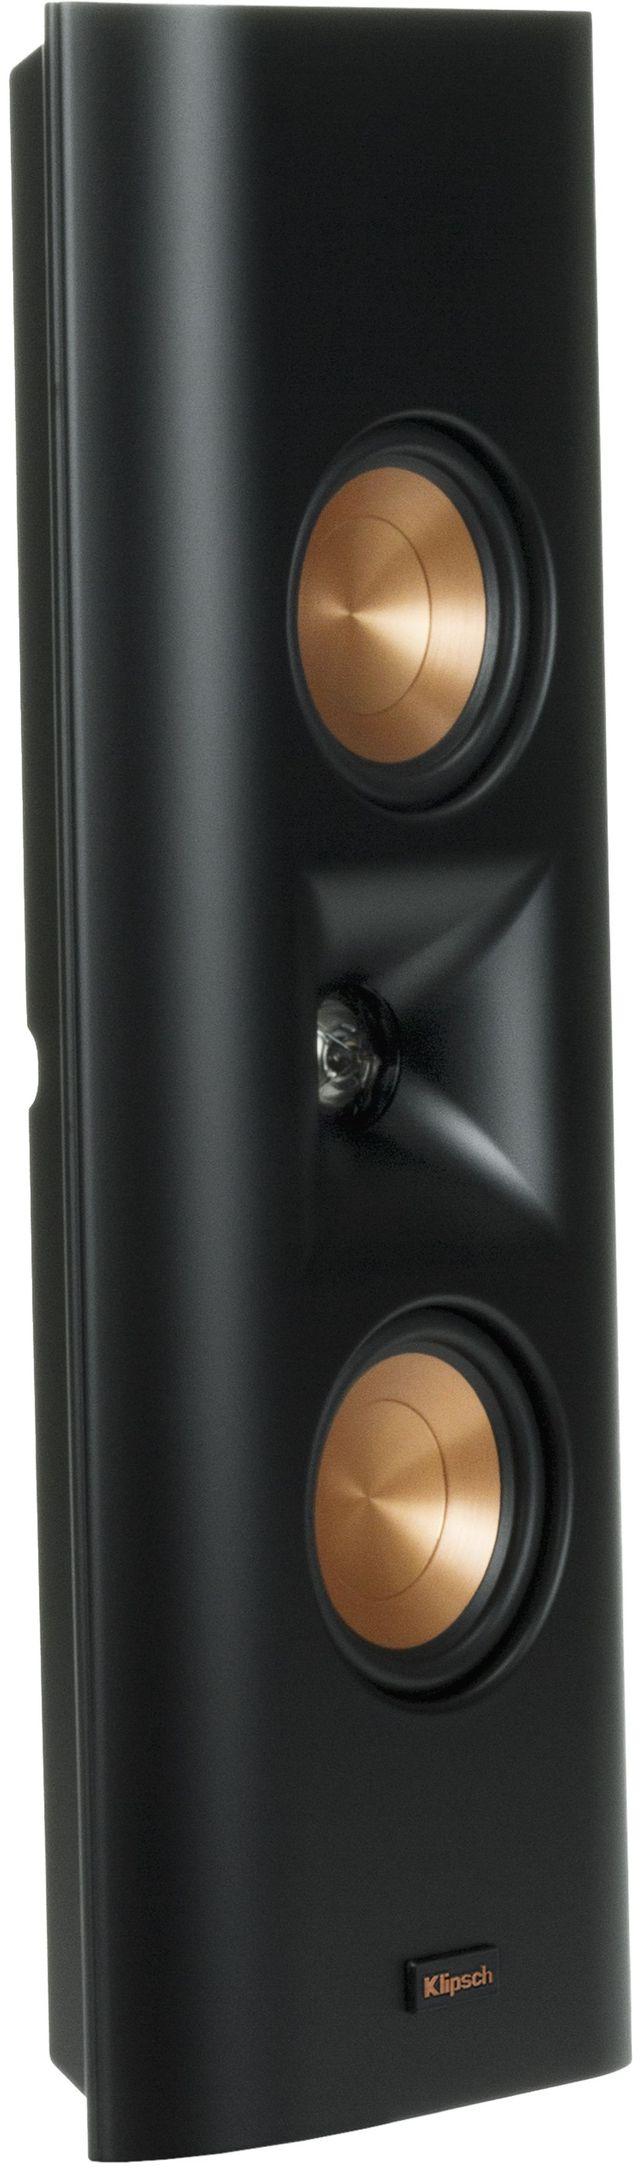 "Klipsch® Reference™ Premiere RP-240D 3.5"" On-Wall Speaker-1064180"